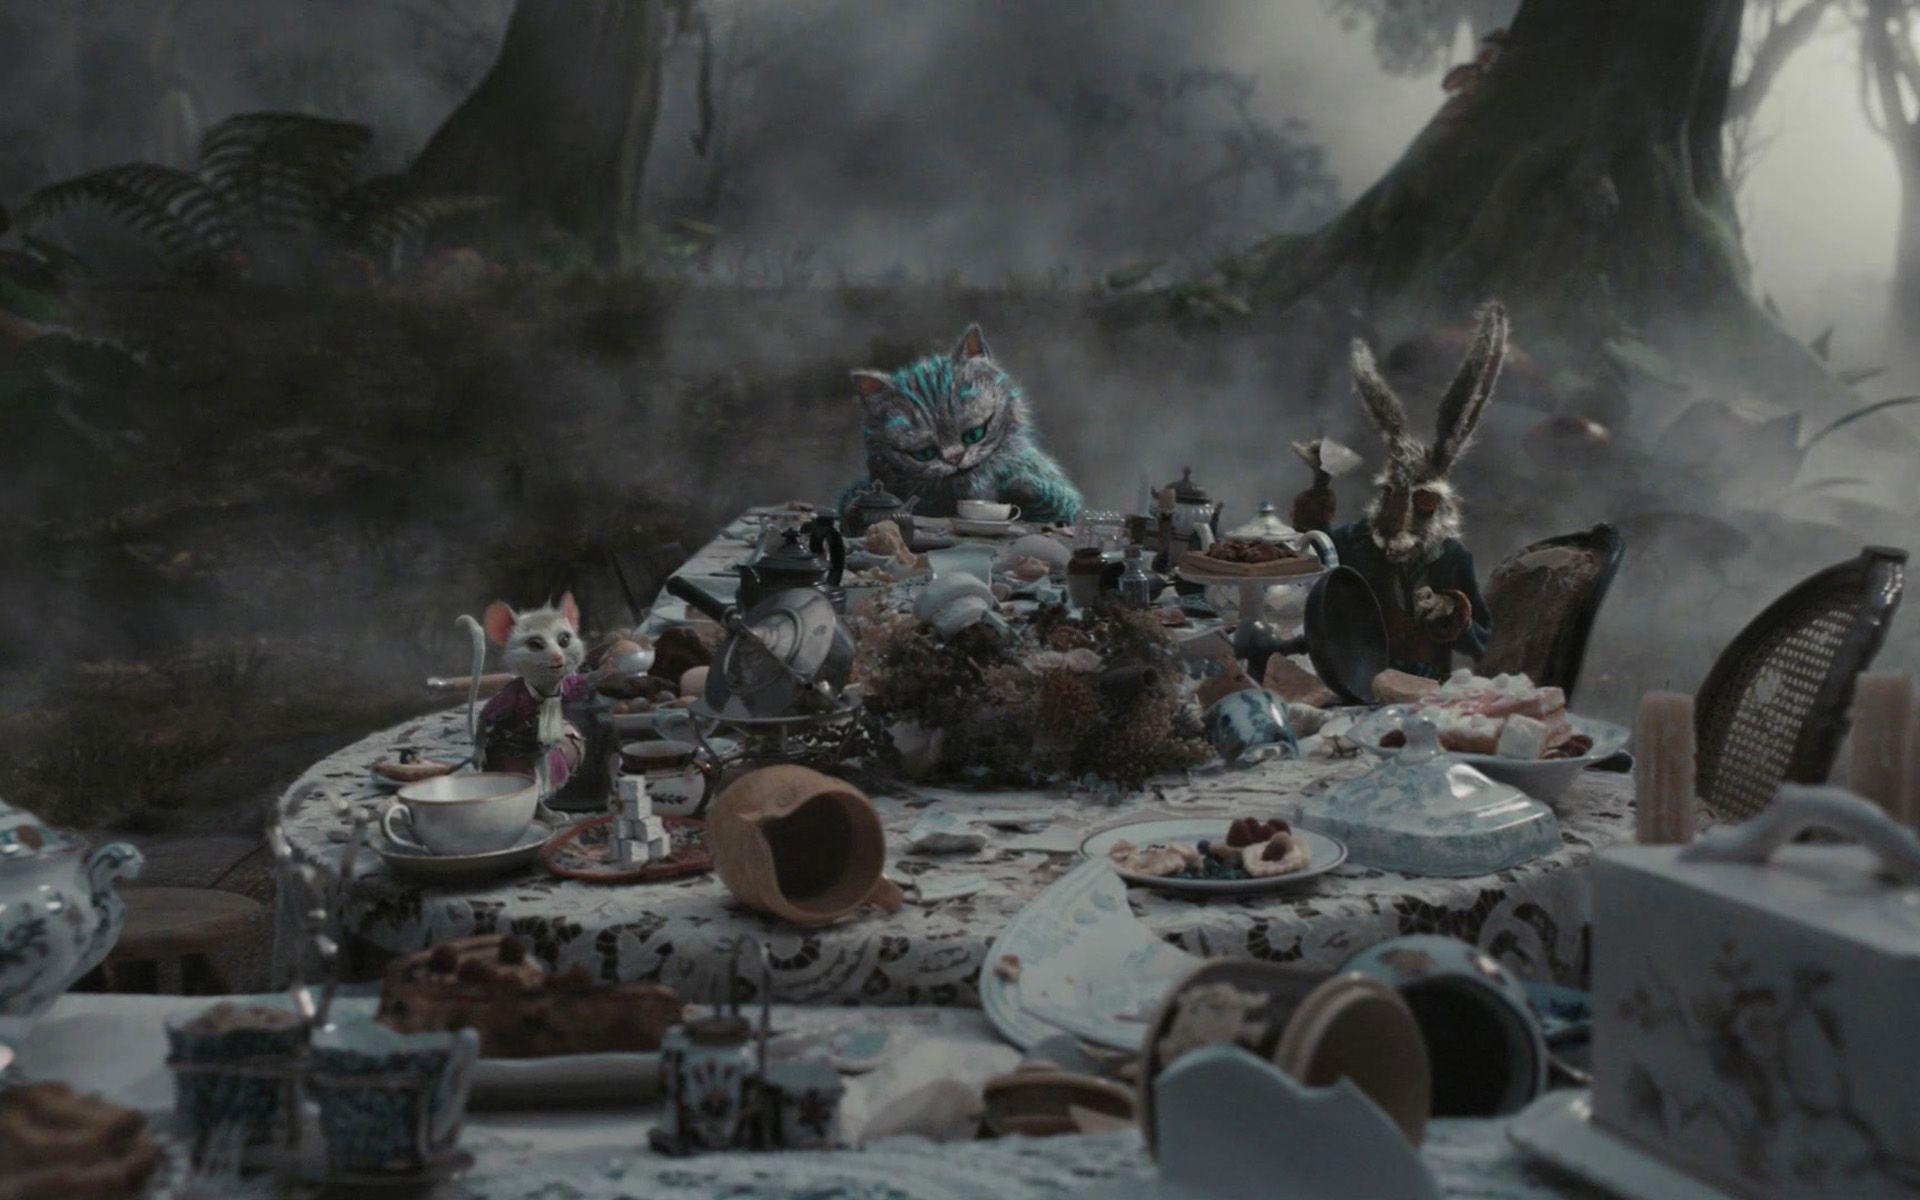 Movie Alice In Wonderland 2010 Alice In Wonderland Wallpaper Alice In Wonderland Aesthetic Dark Alice In Wonderland Alice In Wonderland Tea Party